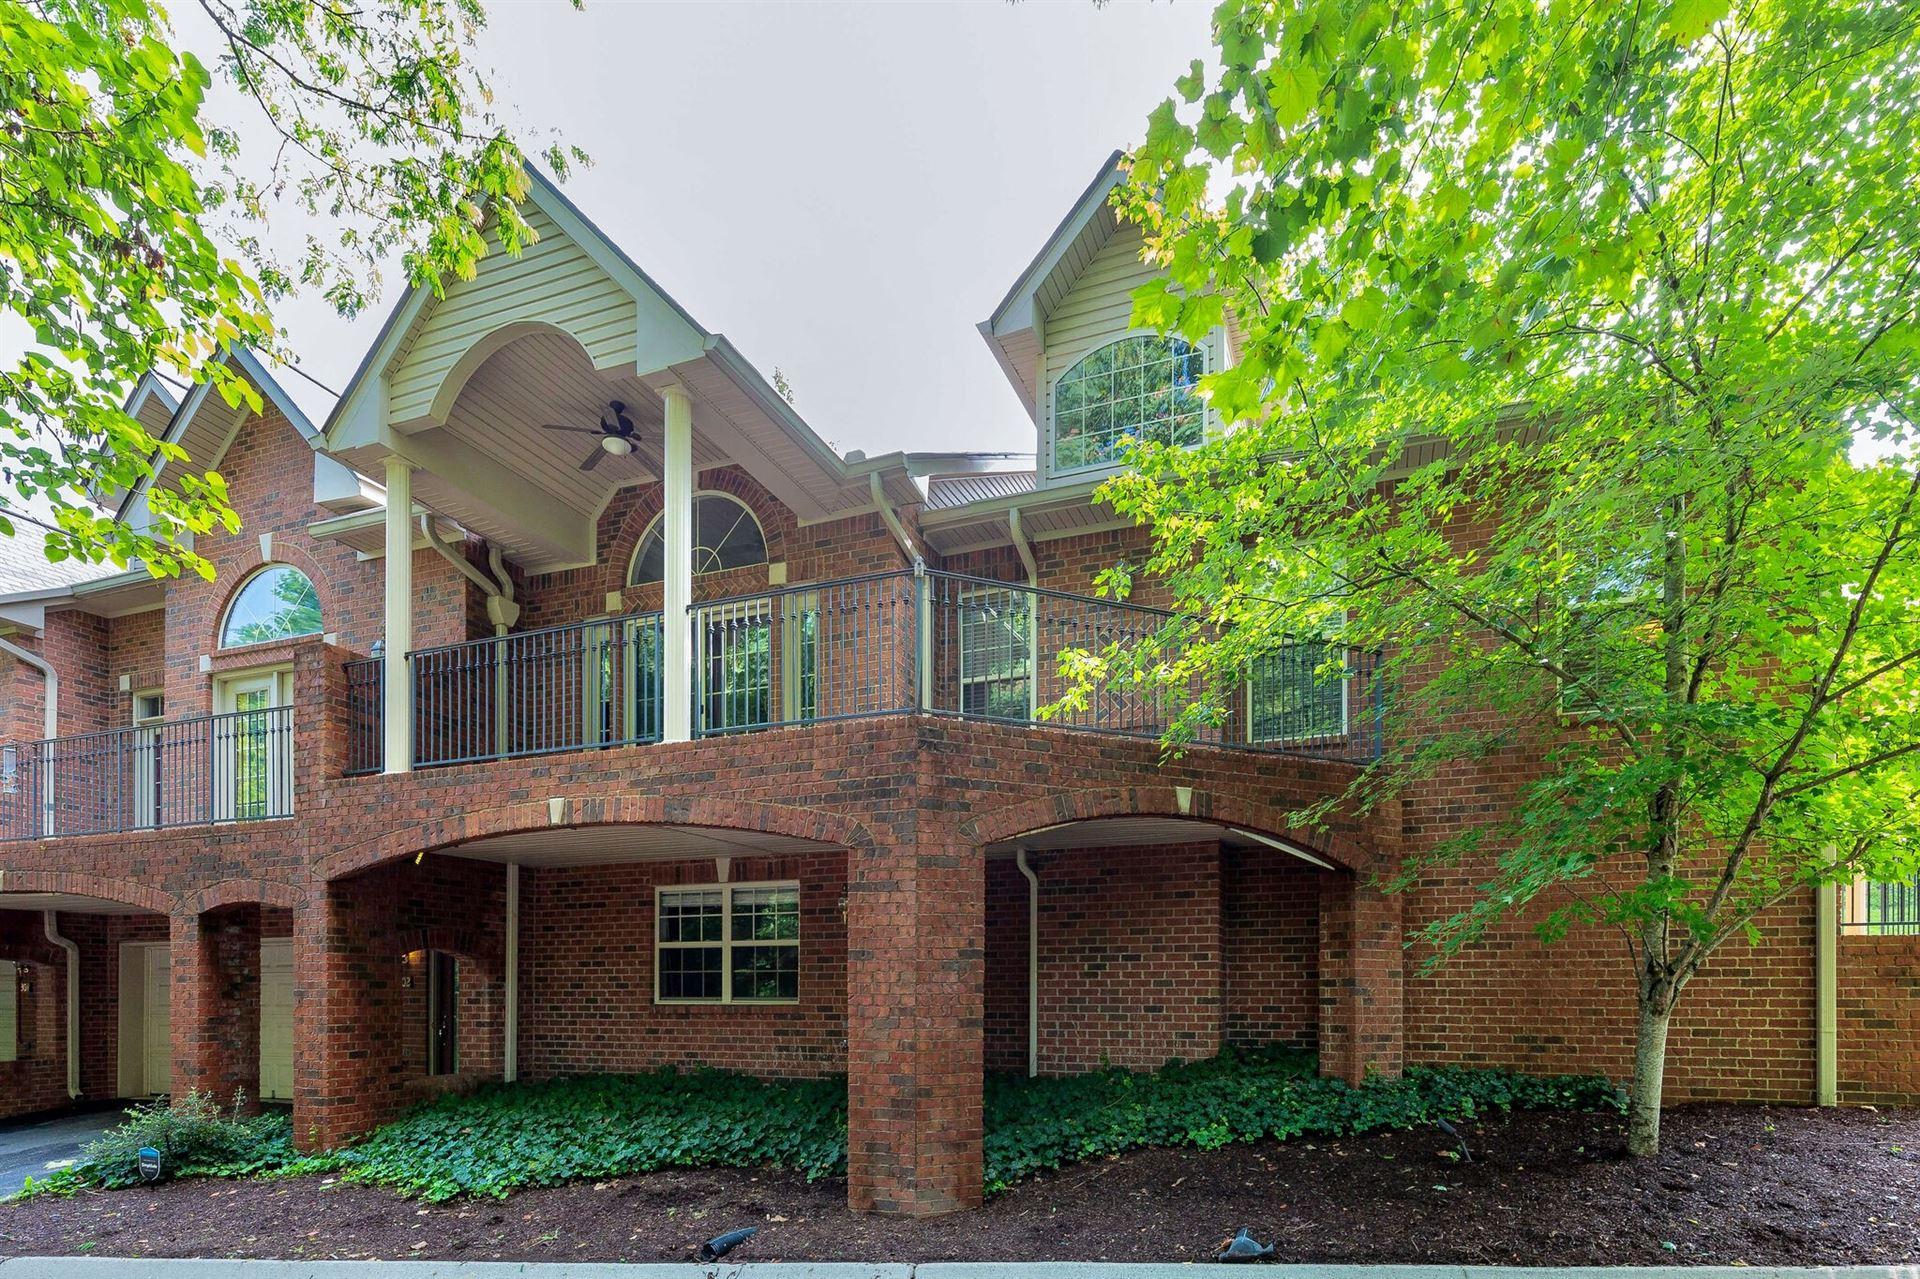 300 Riverstone Blvd, Nashville, TN 37214 - MLS#: 2273046